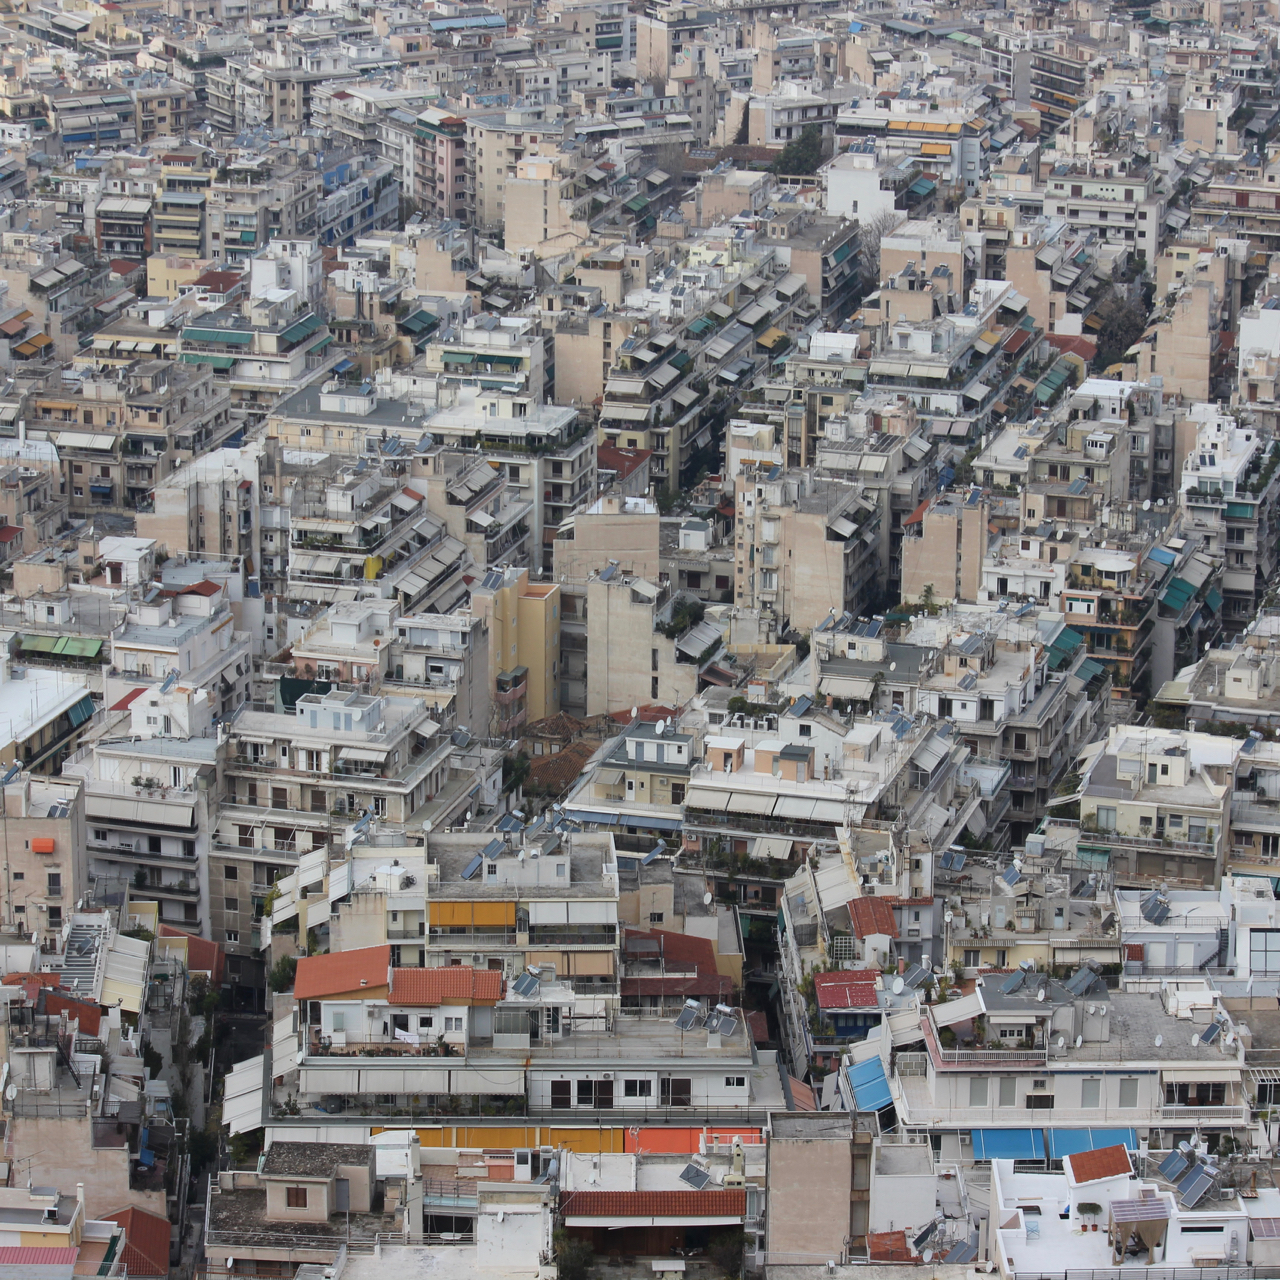 Athens, Greece - 31